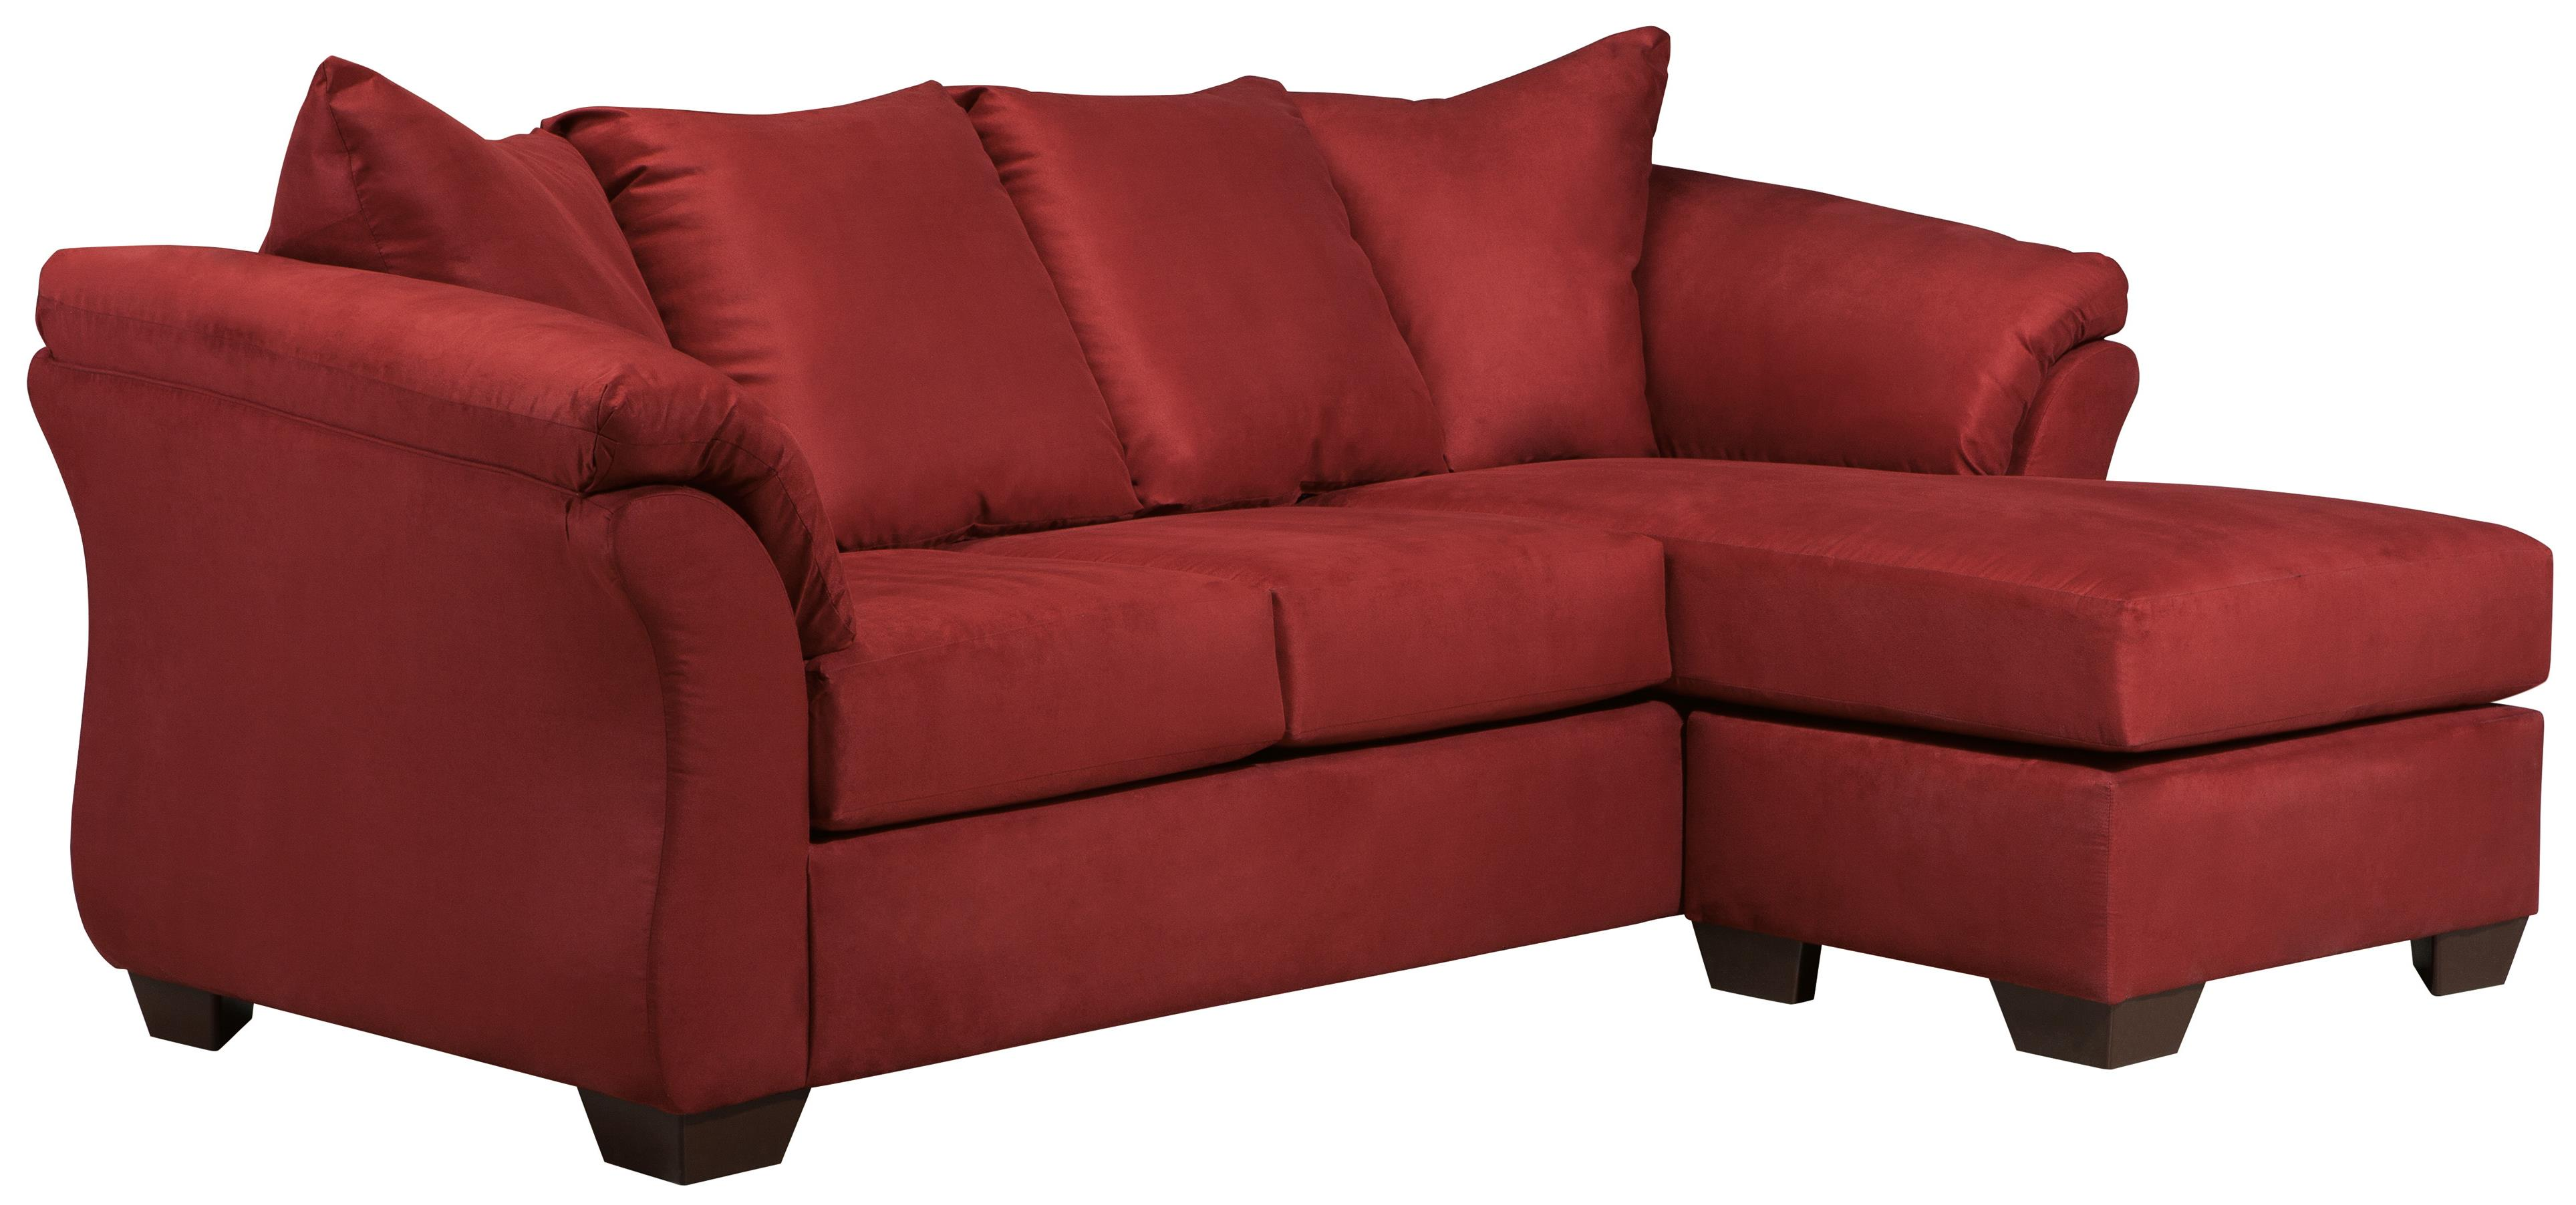 Signature design by ashley york salsa contemporary sofa for Divan vs chaise